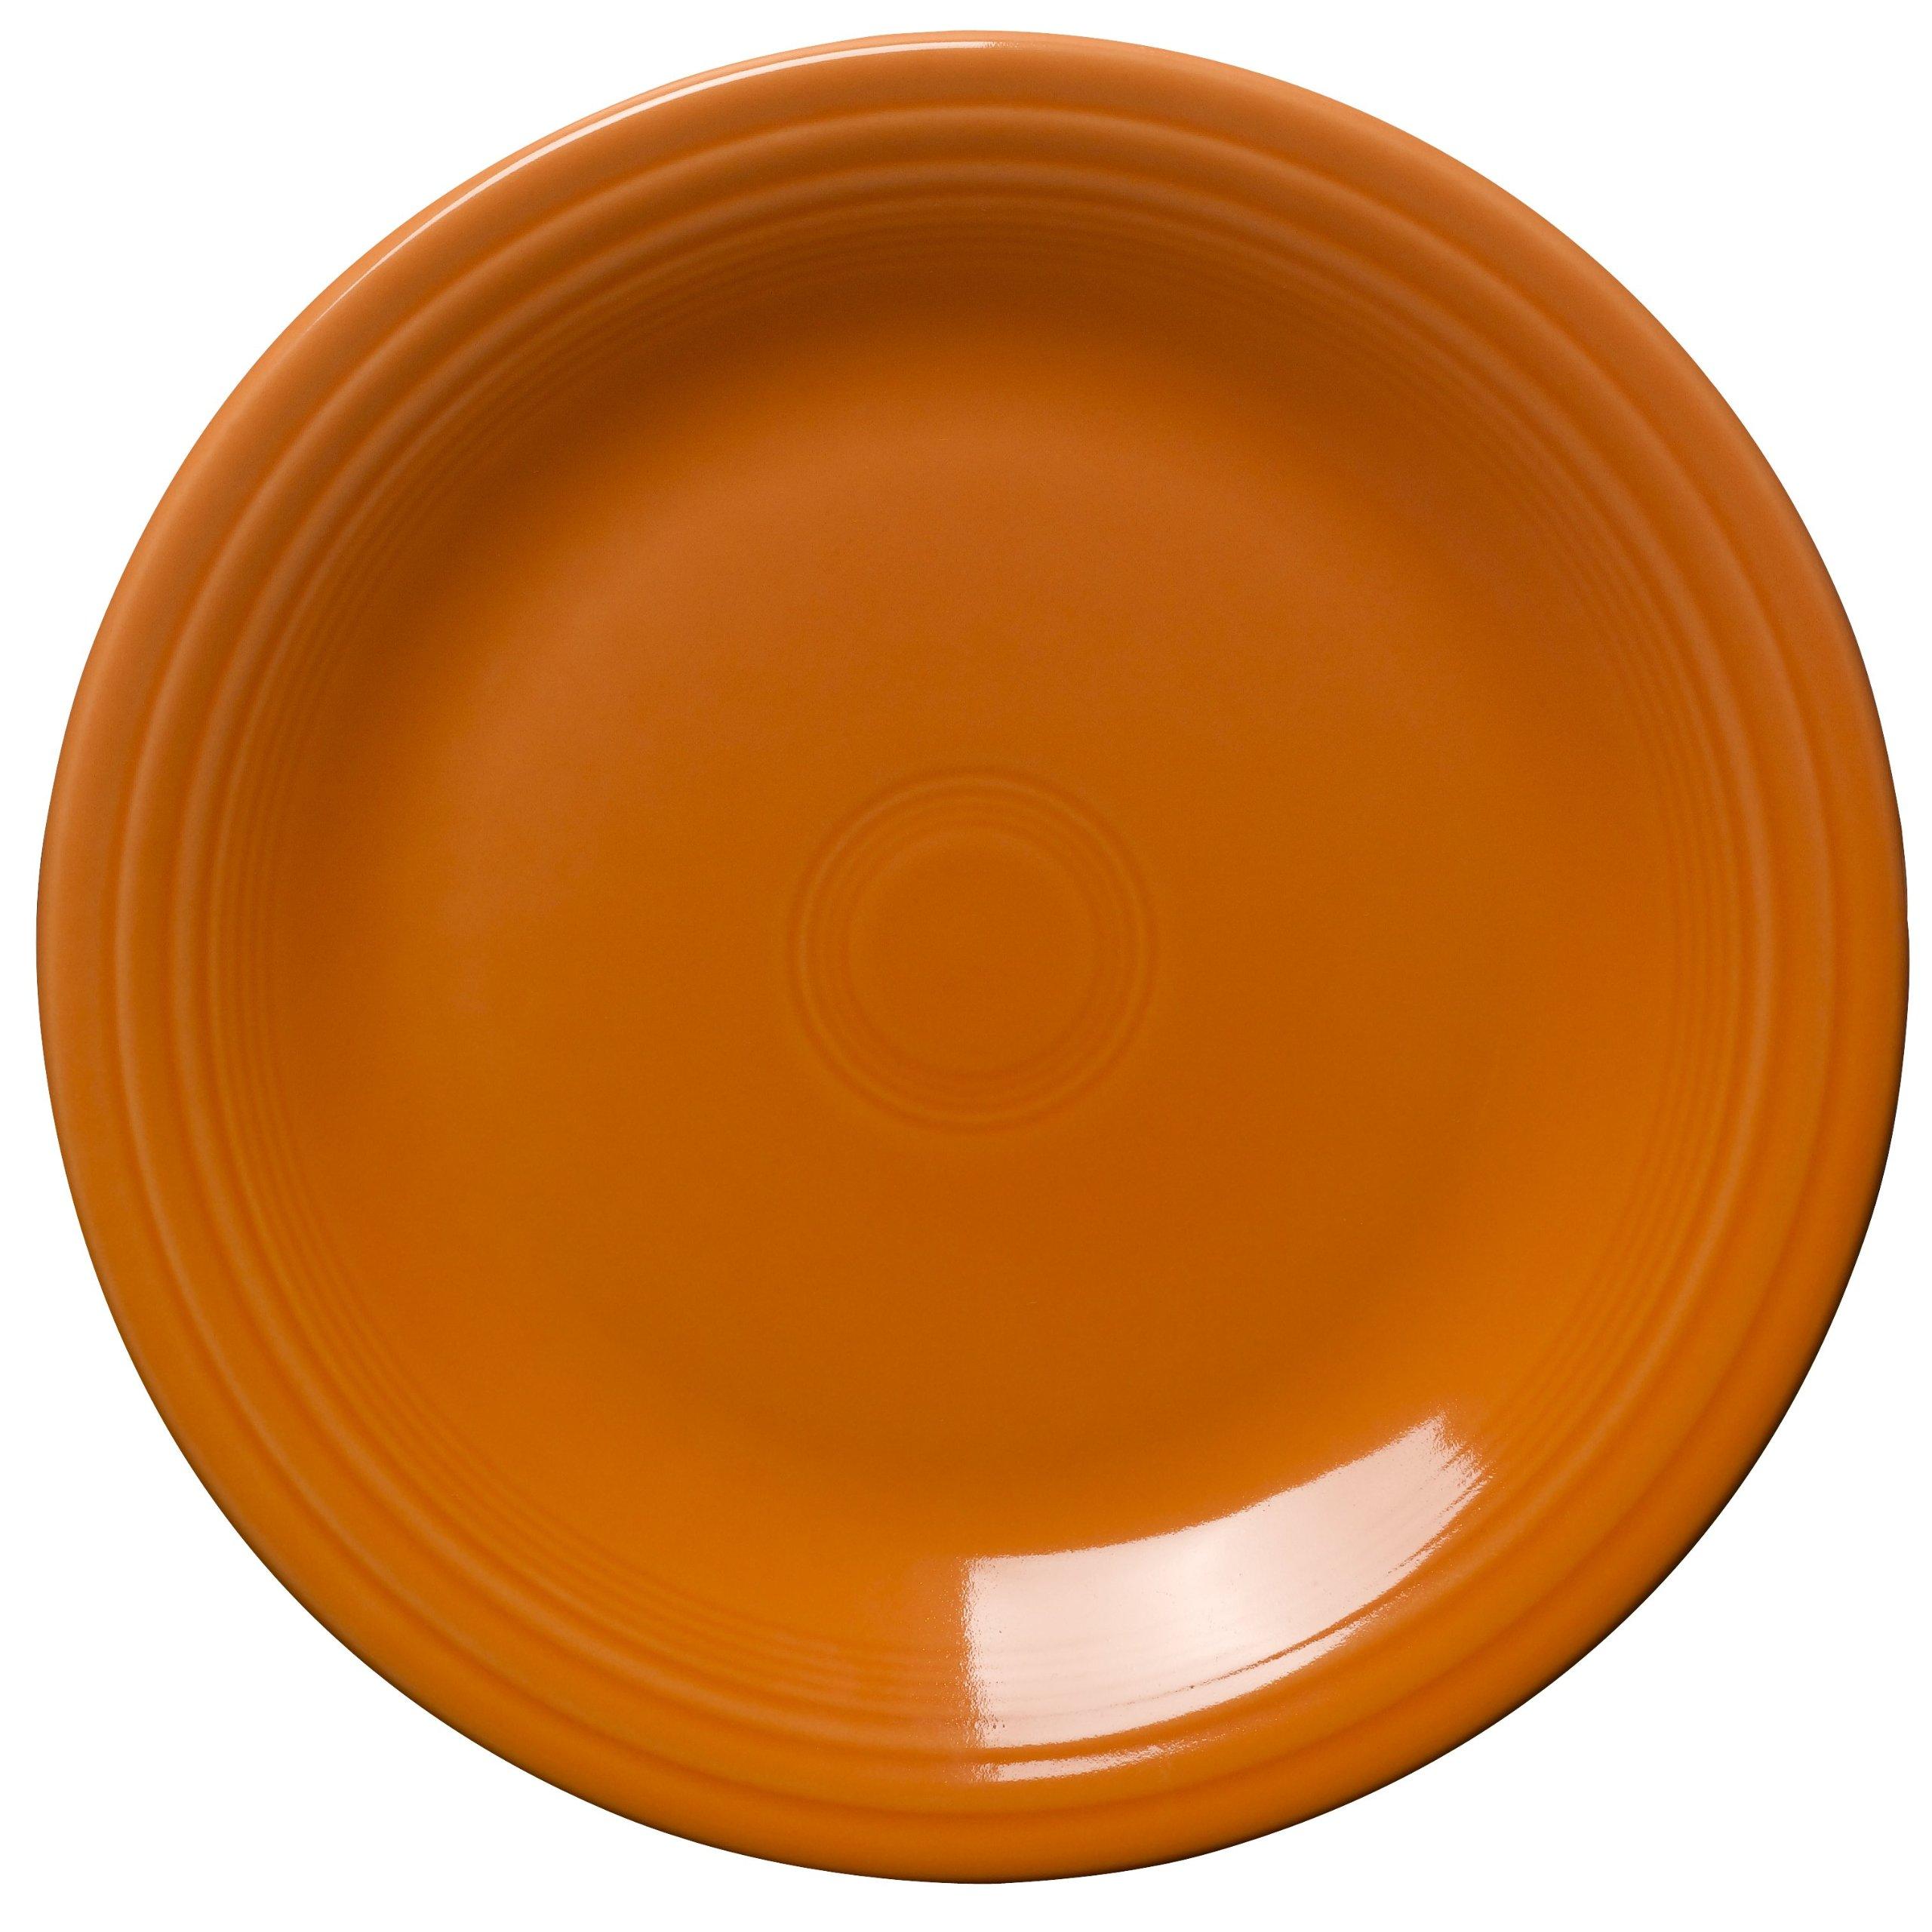 Fiesta 10-1/2-Inch Dinner Plate, Tangerine